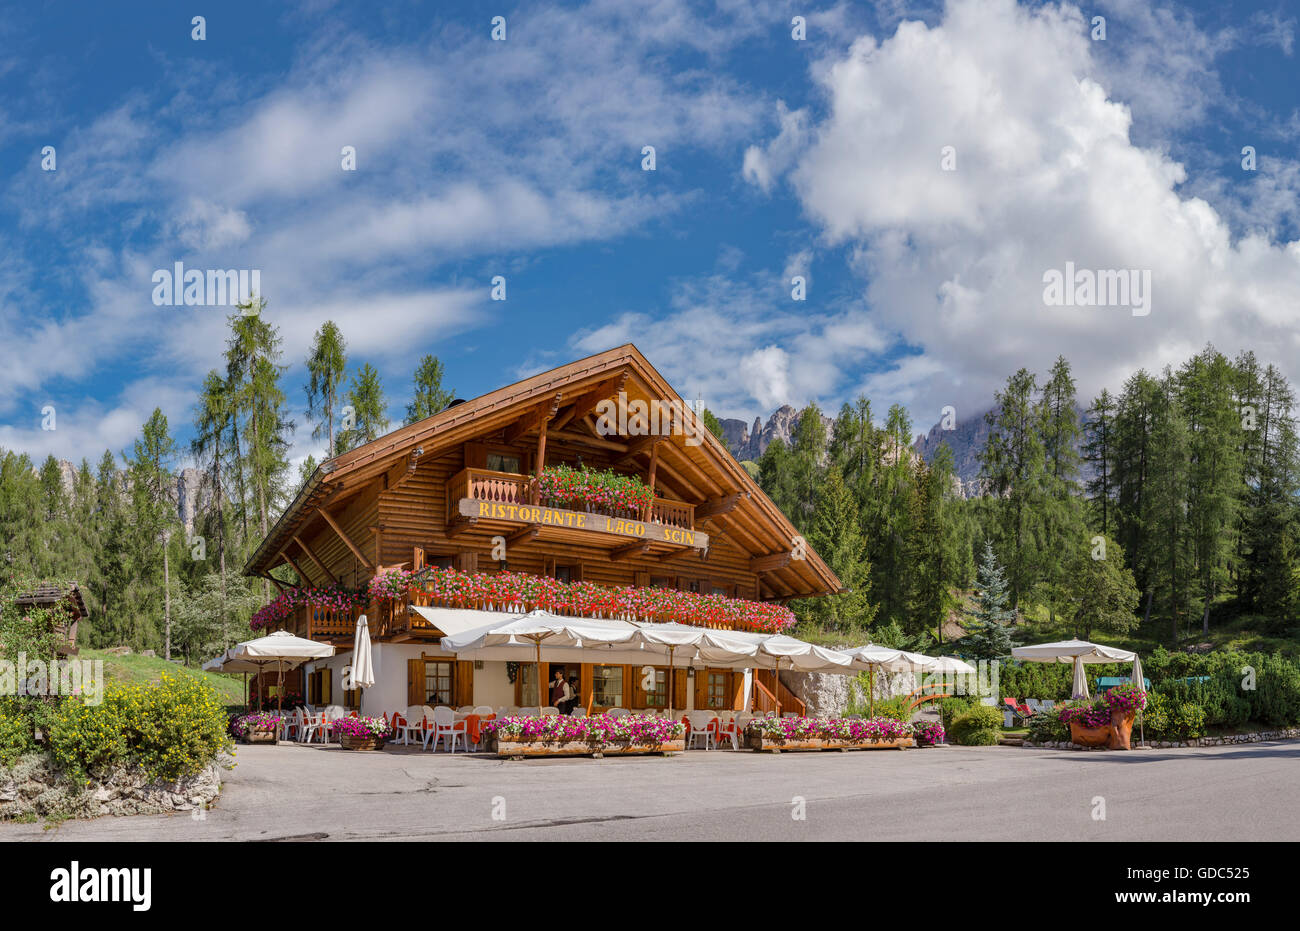 Cortina d'Ampezzo,Italia,Restaurant Lago Scin - Stock Image